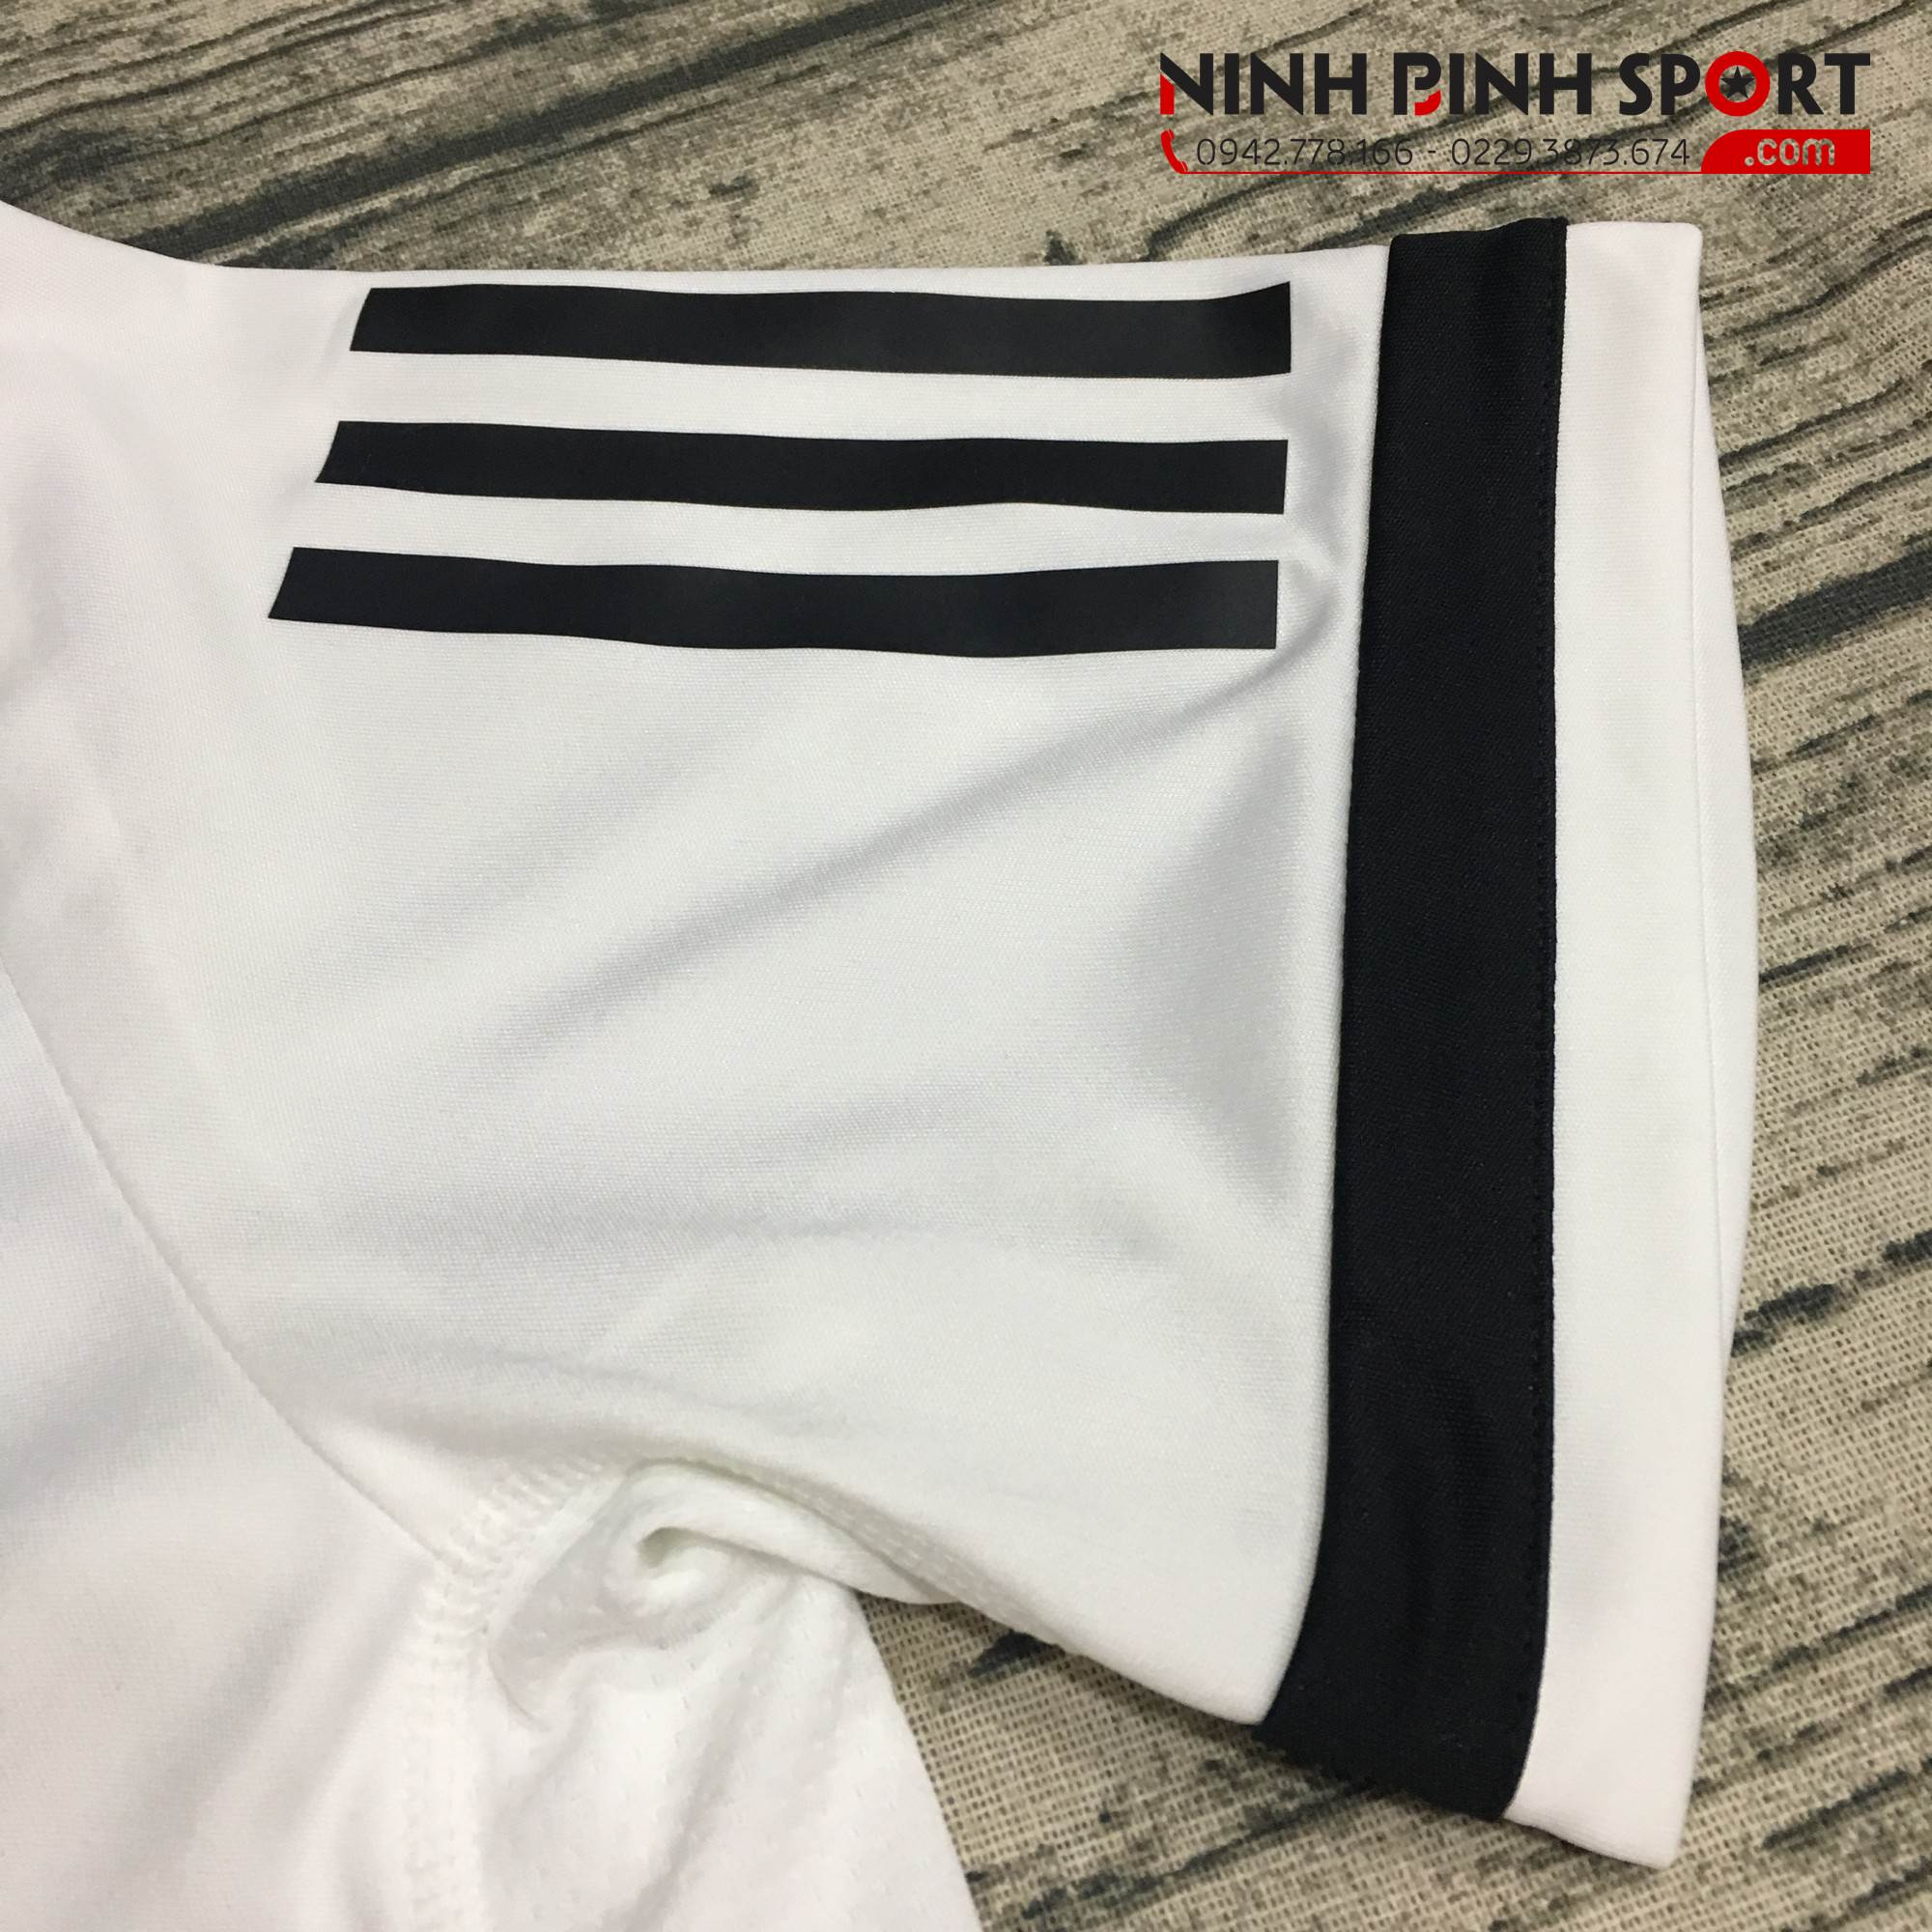 Áo thể thao nam Adidas Club 3-Stripes Polo CE1415